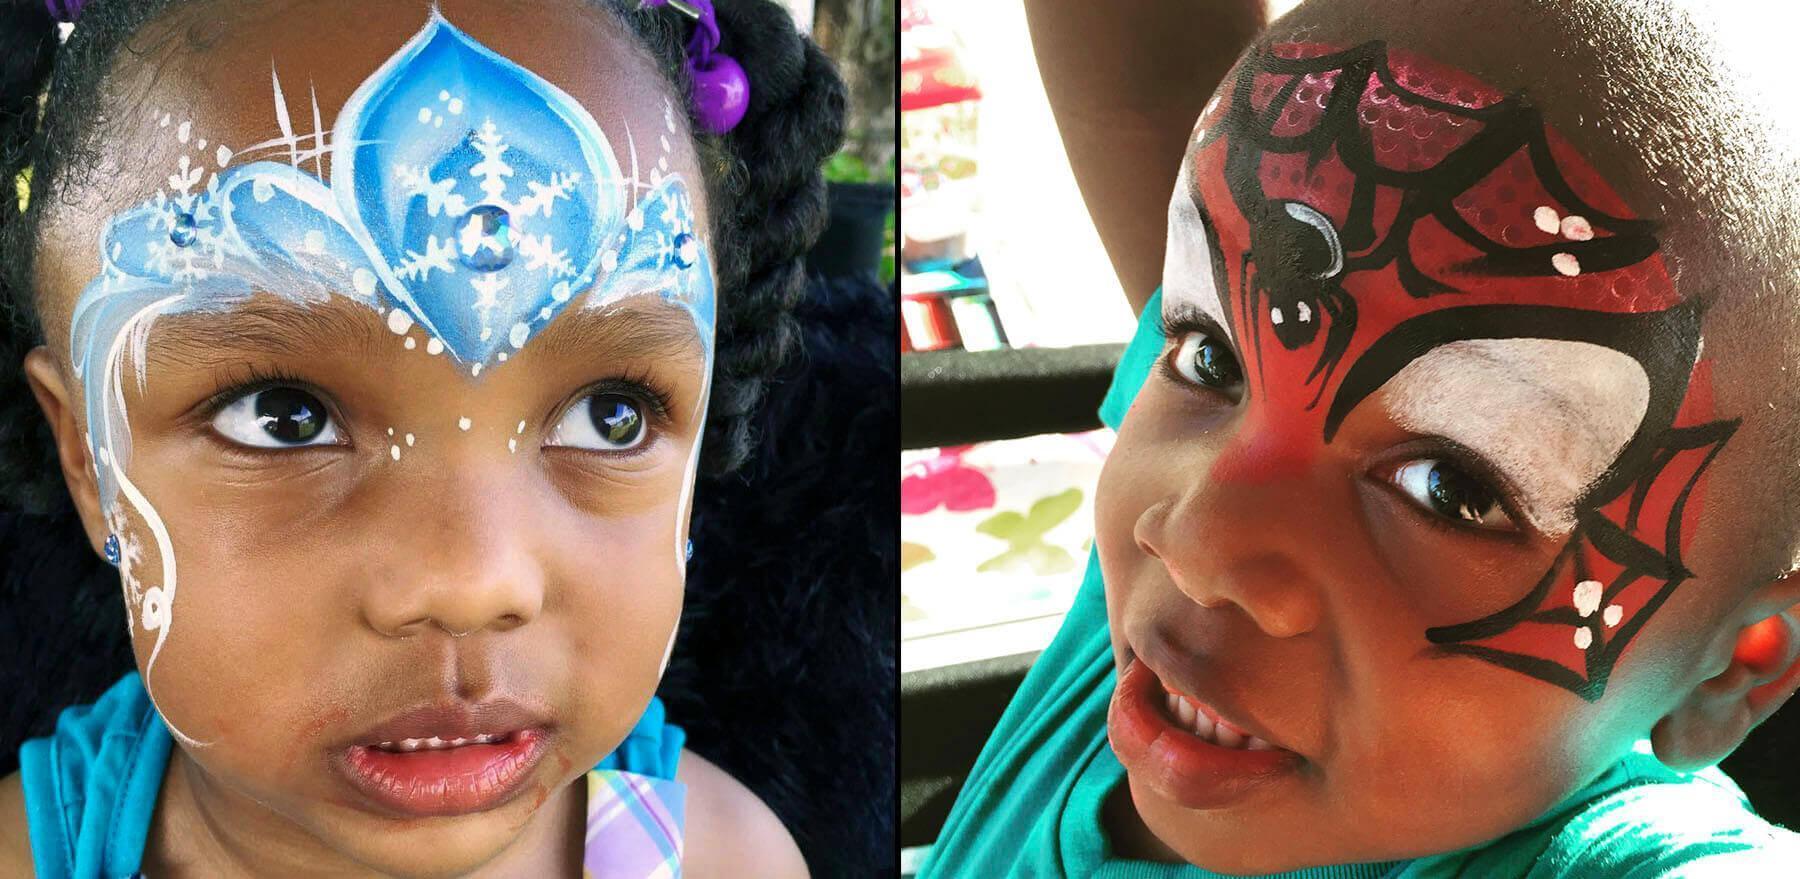 orlando-florida-face-painter-for-kids-parties